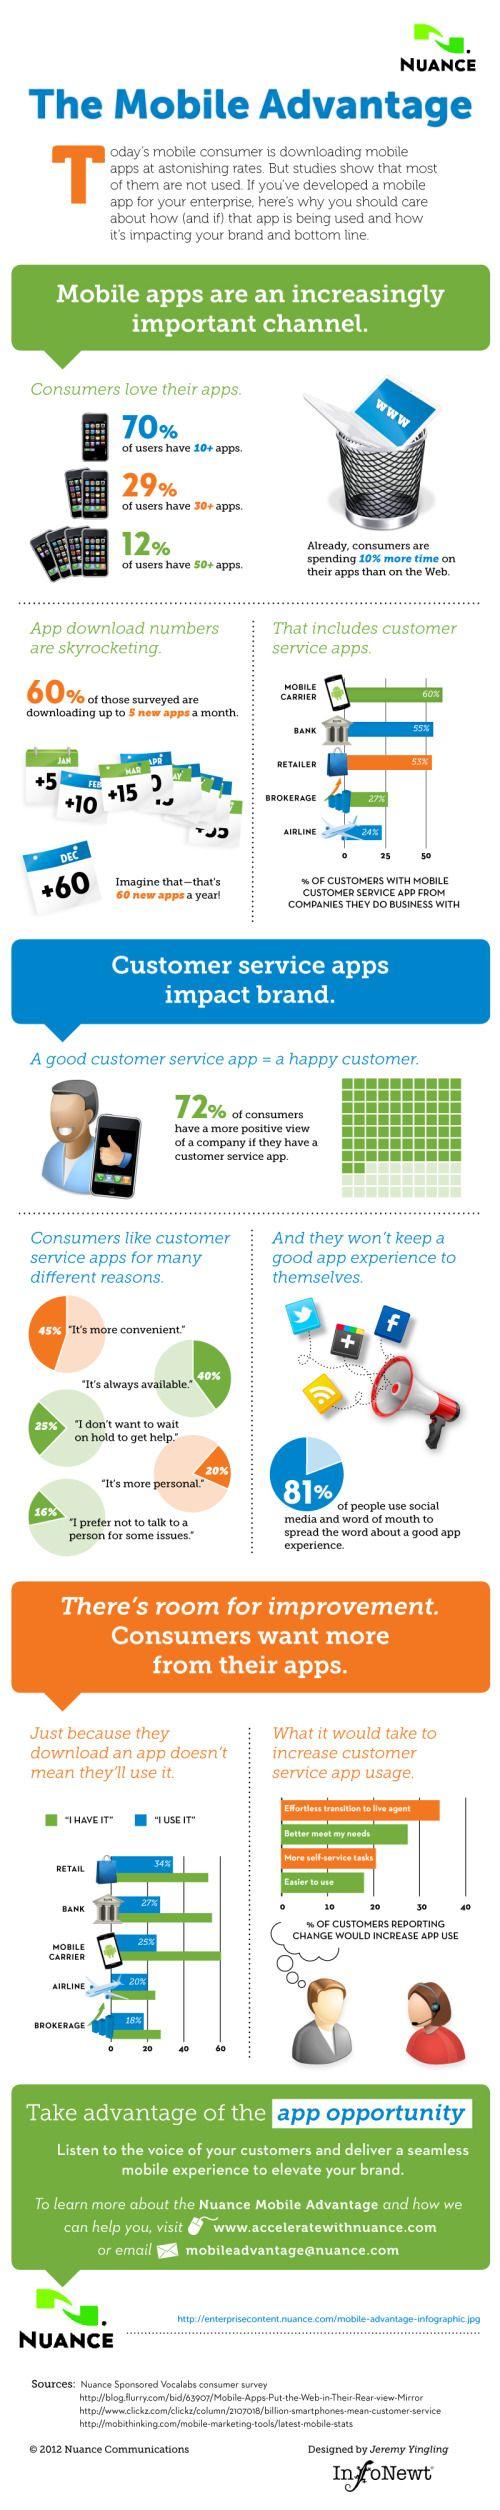 The Mobile Advantage #infographic